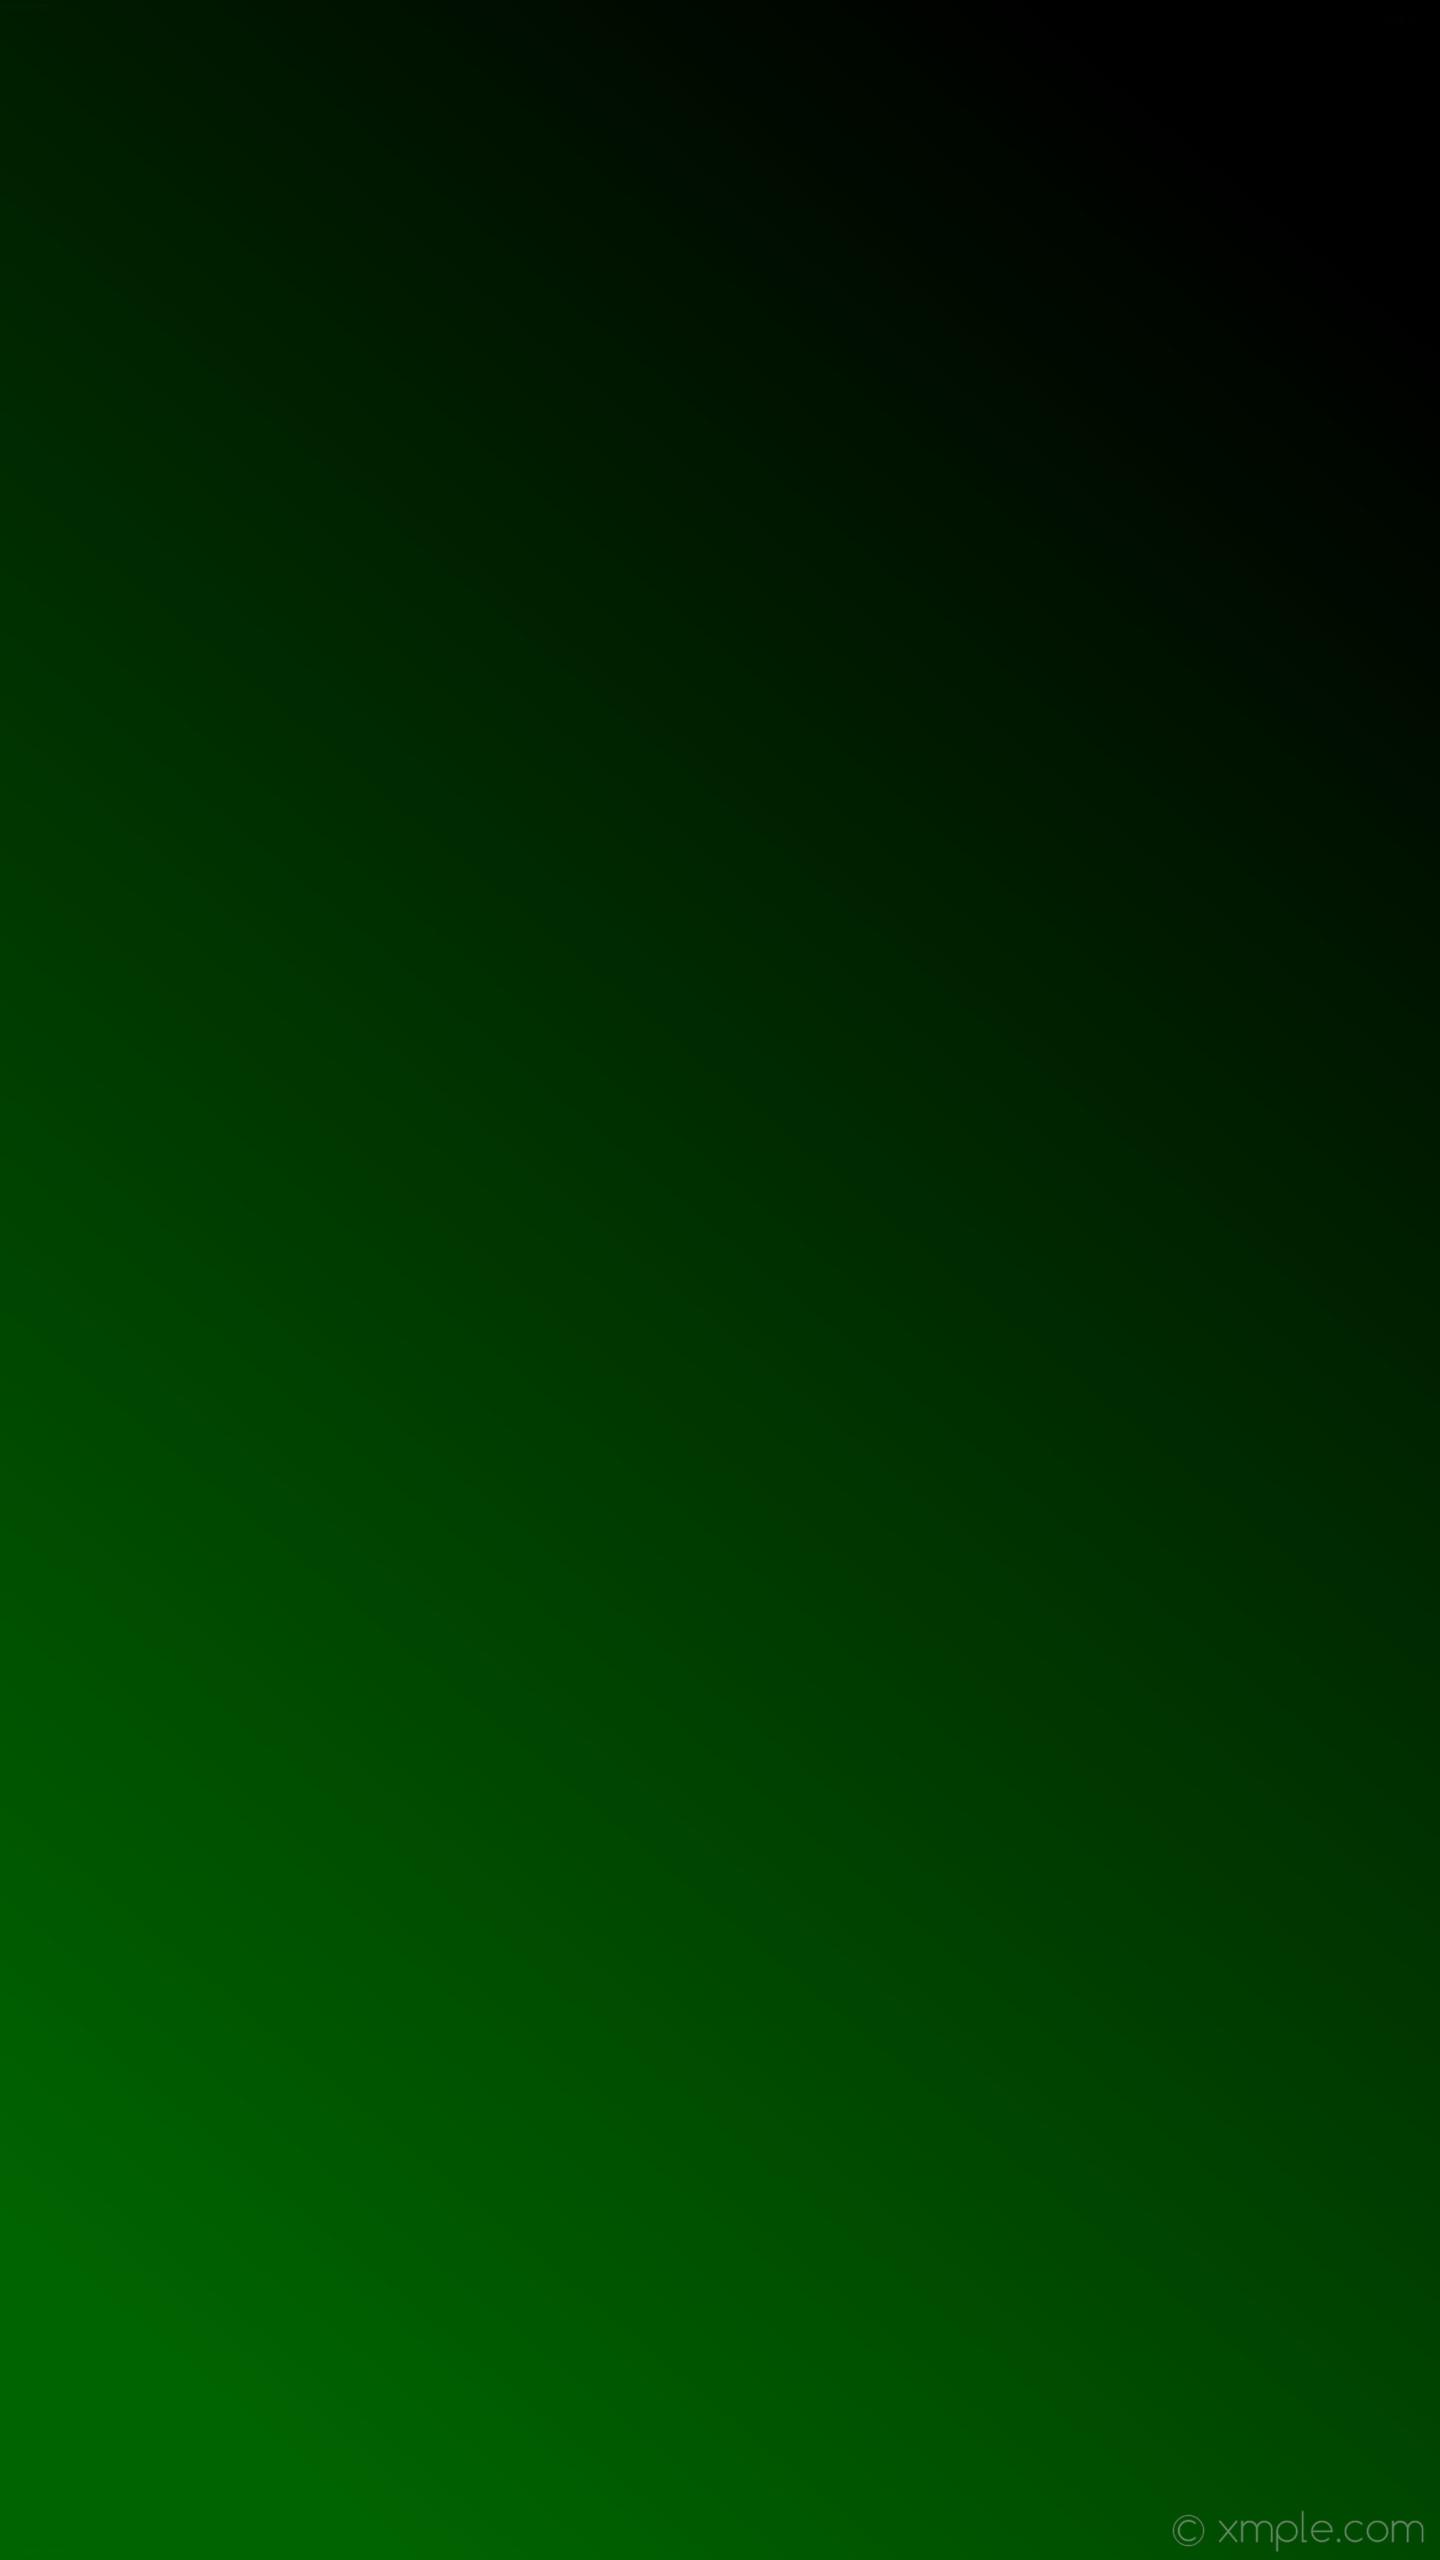 wallpaper gradient green black linear dark green #000000 #006400 75°